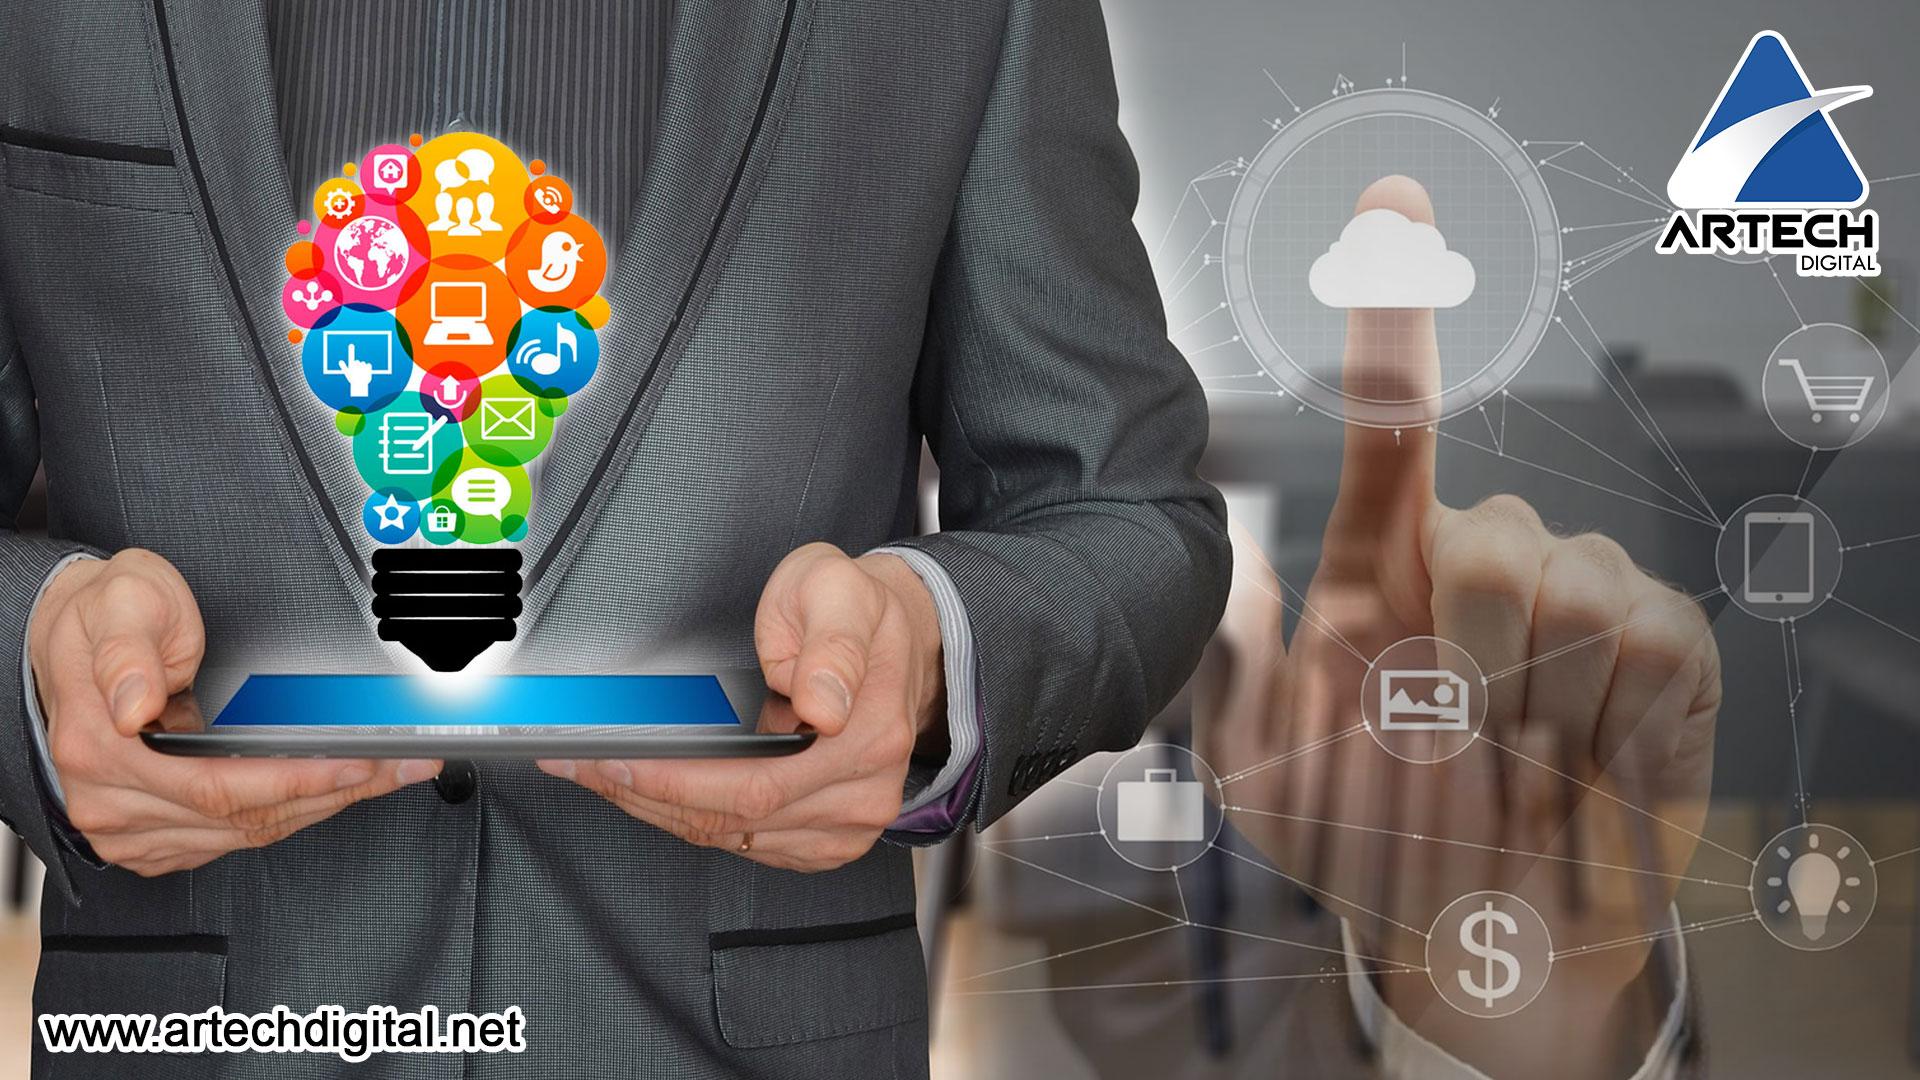 Artech Digital - Digital Marketing strategies